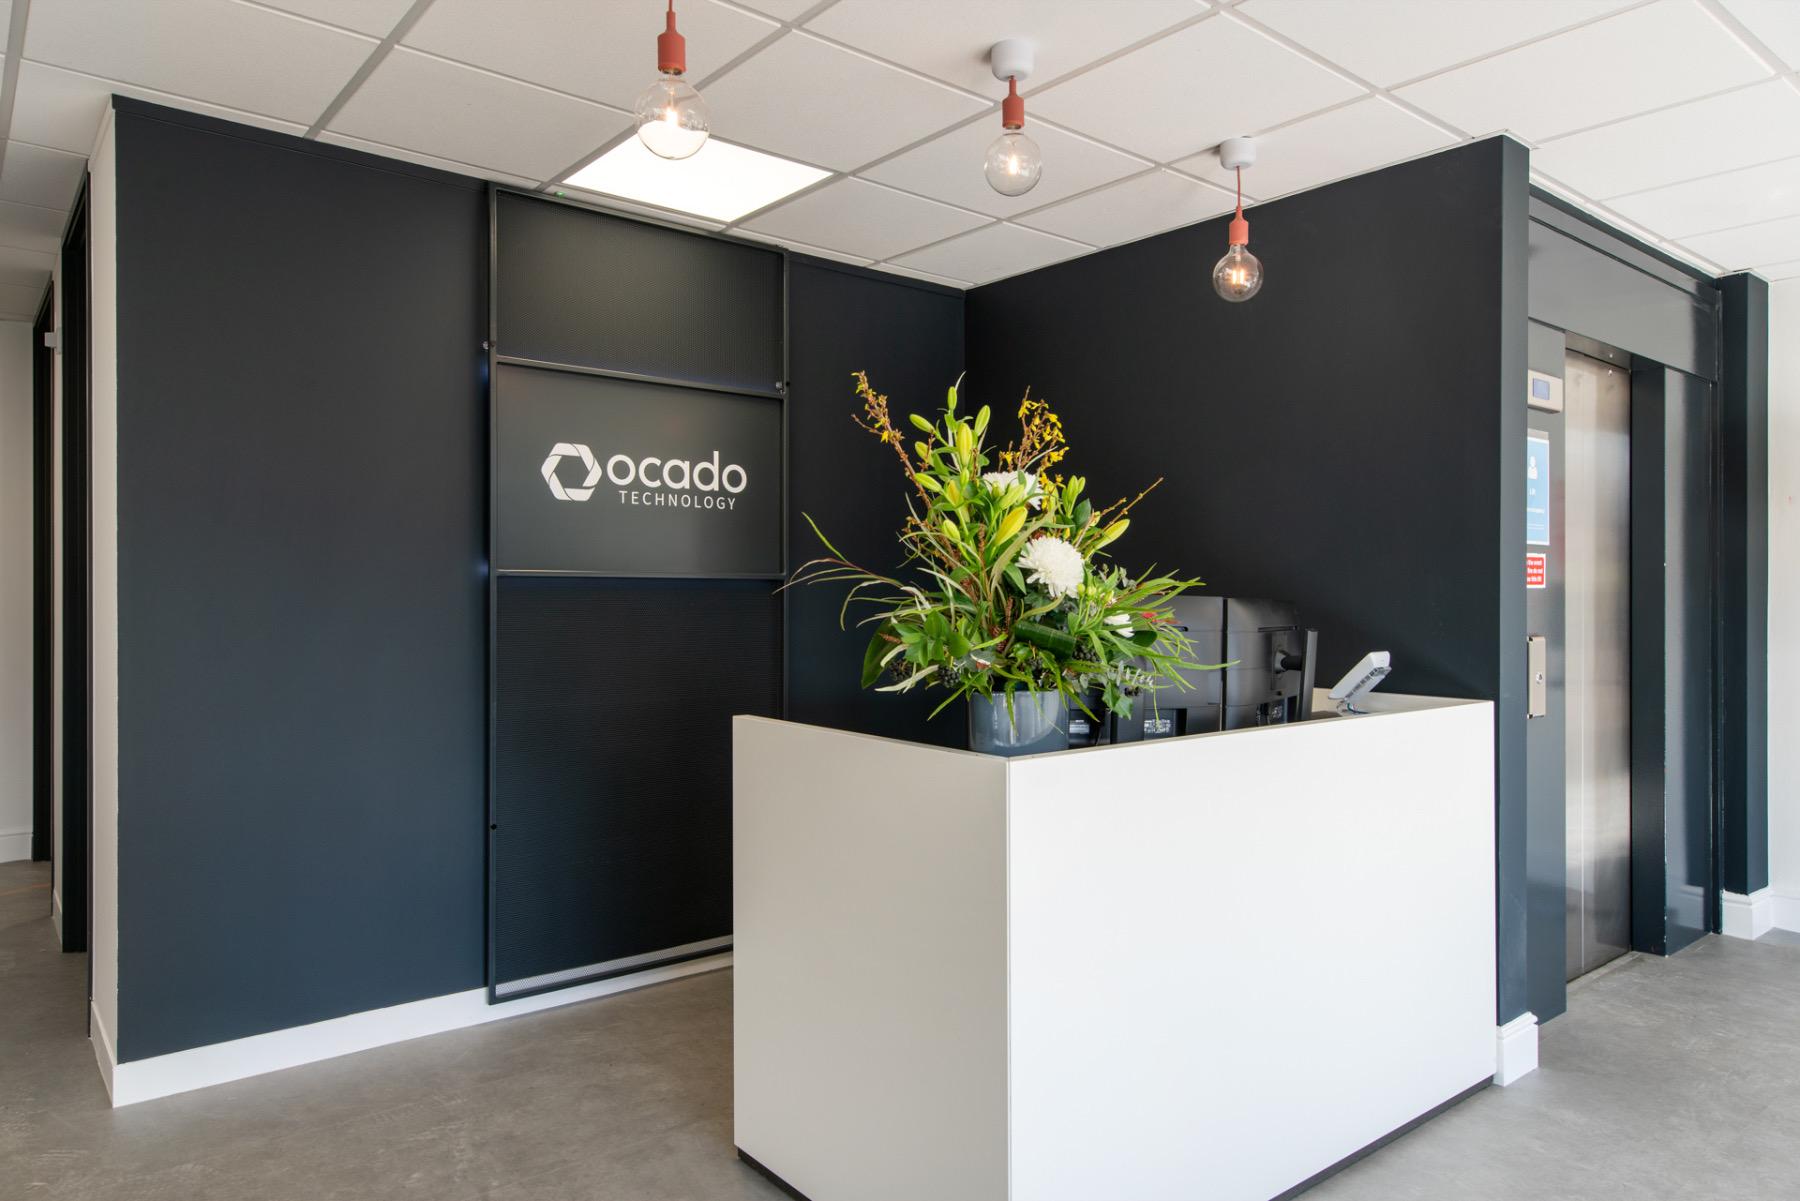 ocado-technology-office-1